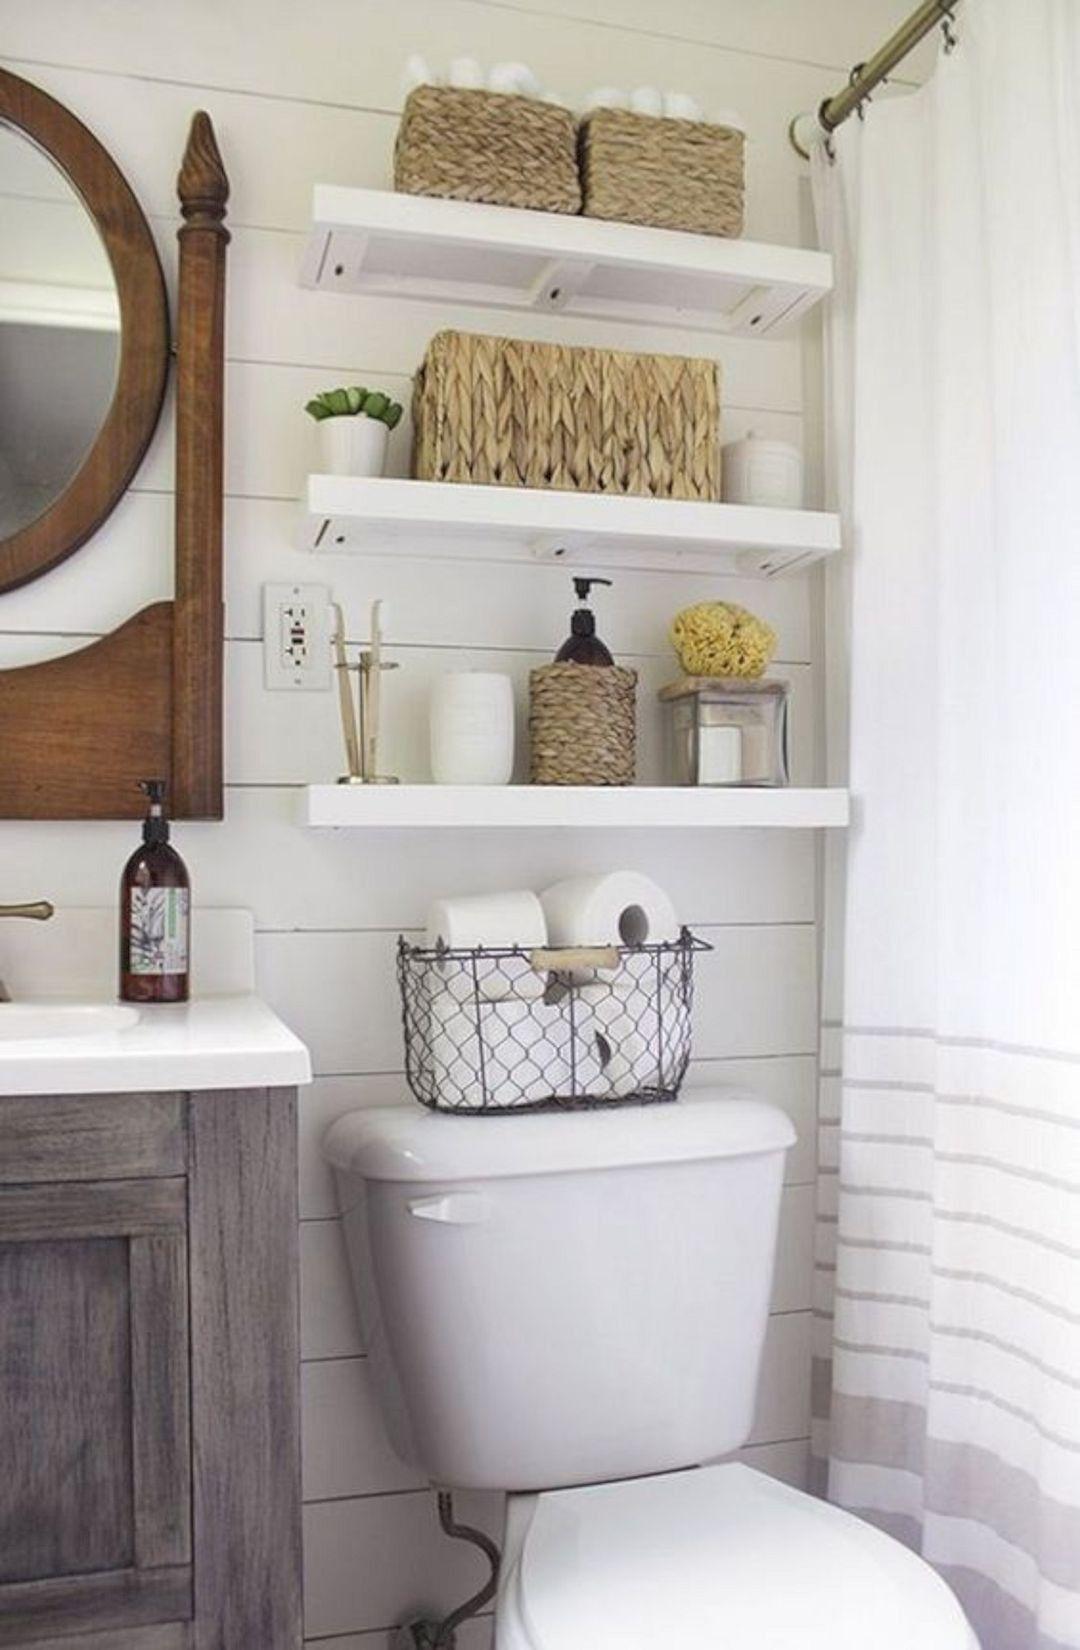 Small Bathroom Wall Decor Ideas 2020 Small Space Bathroom Small Bathroom Storage Small Bathroom Shelves